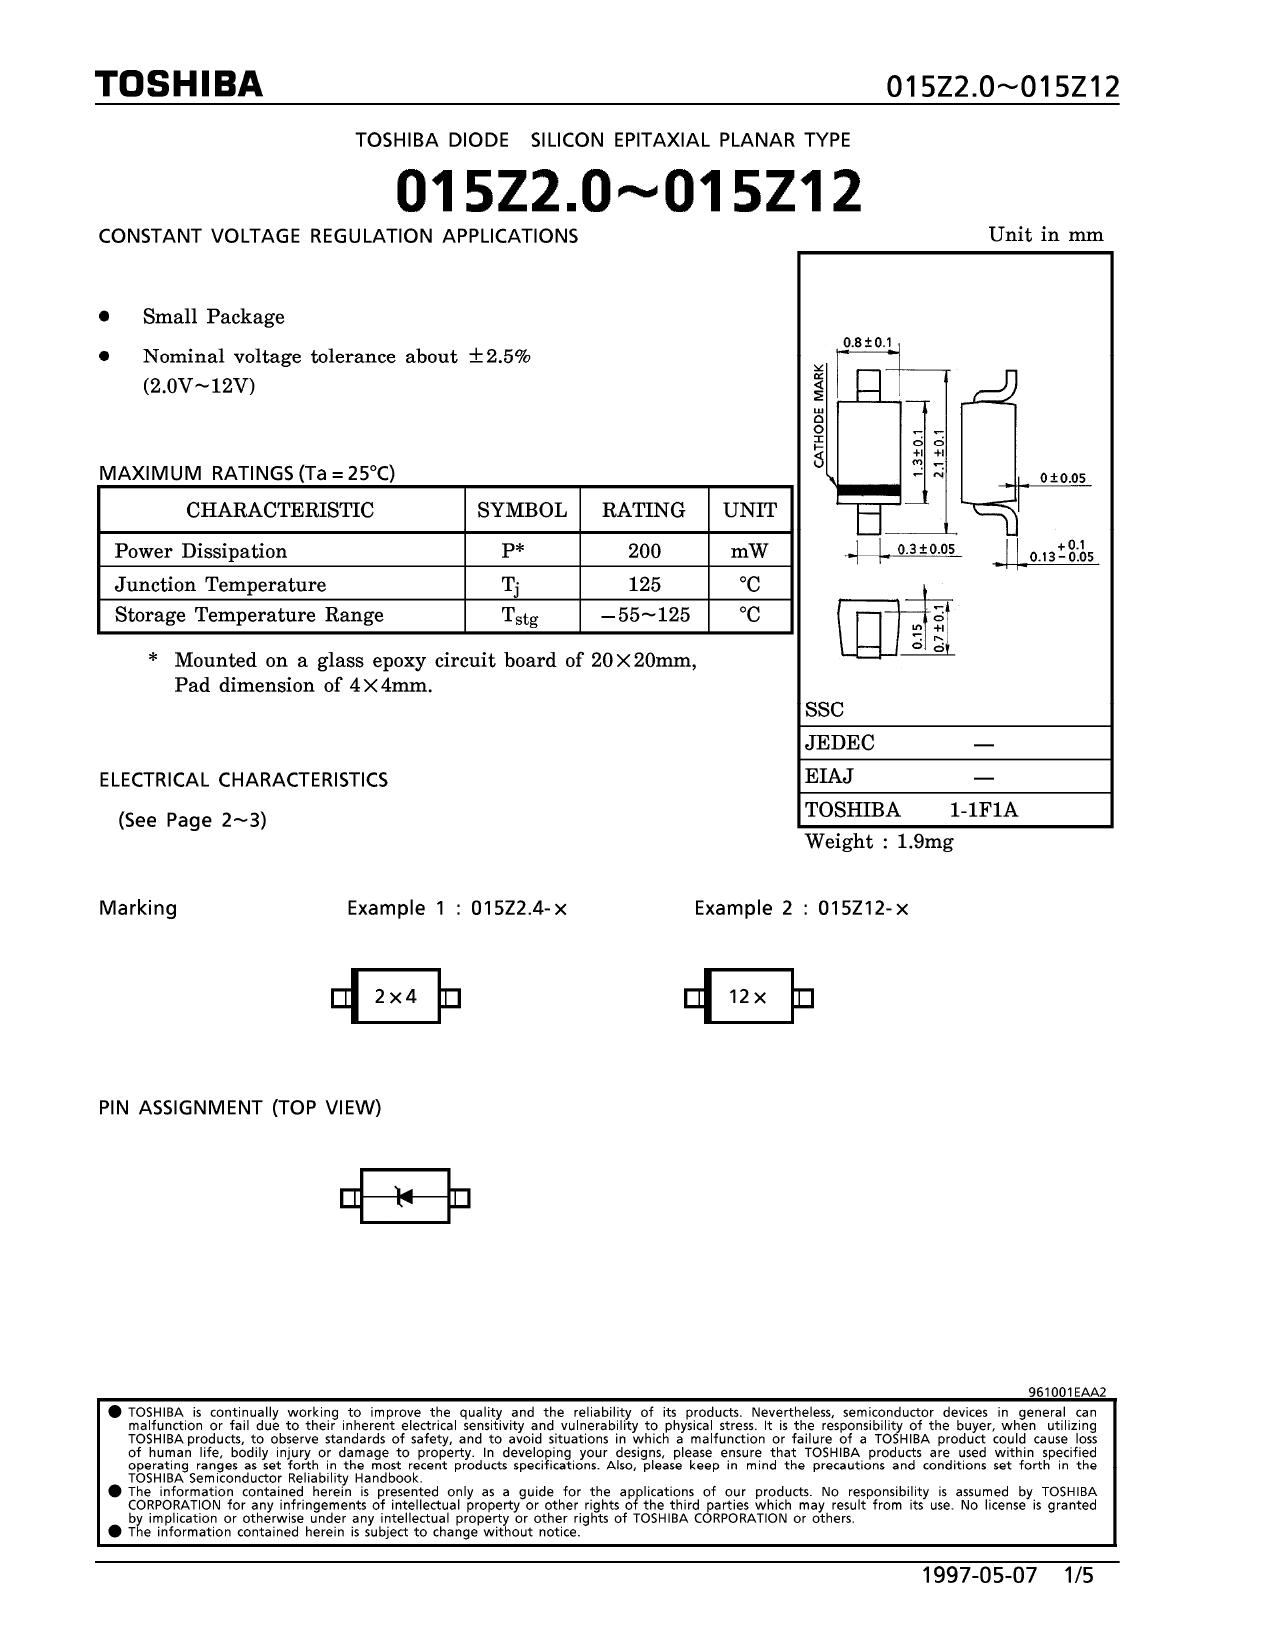 015Z2.0 datasheet